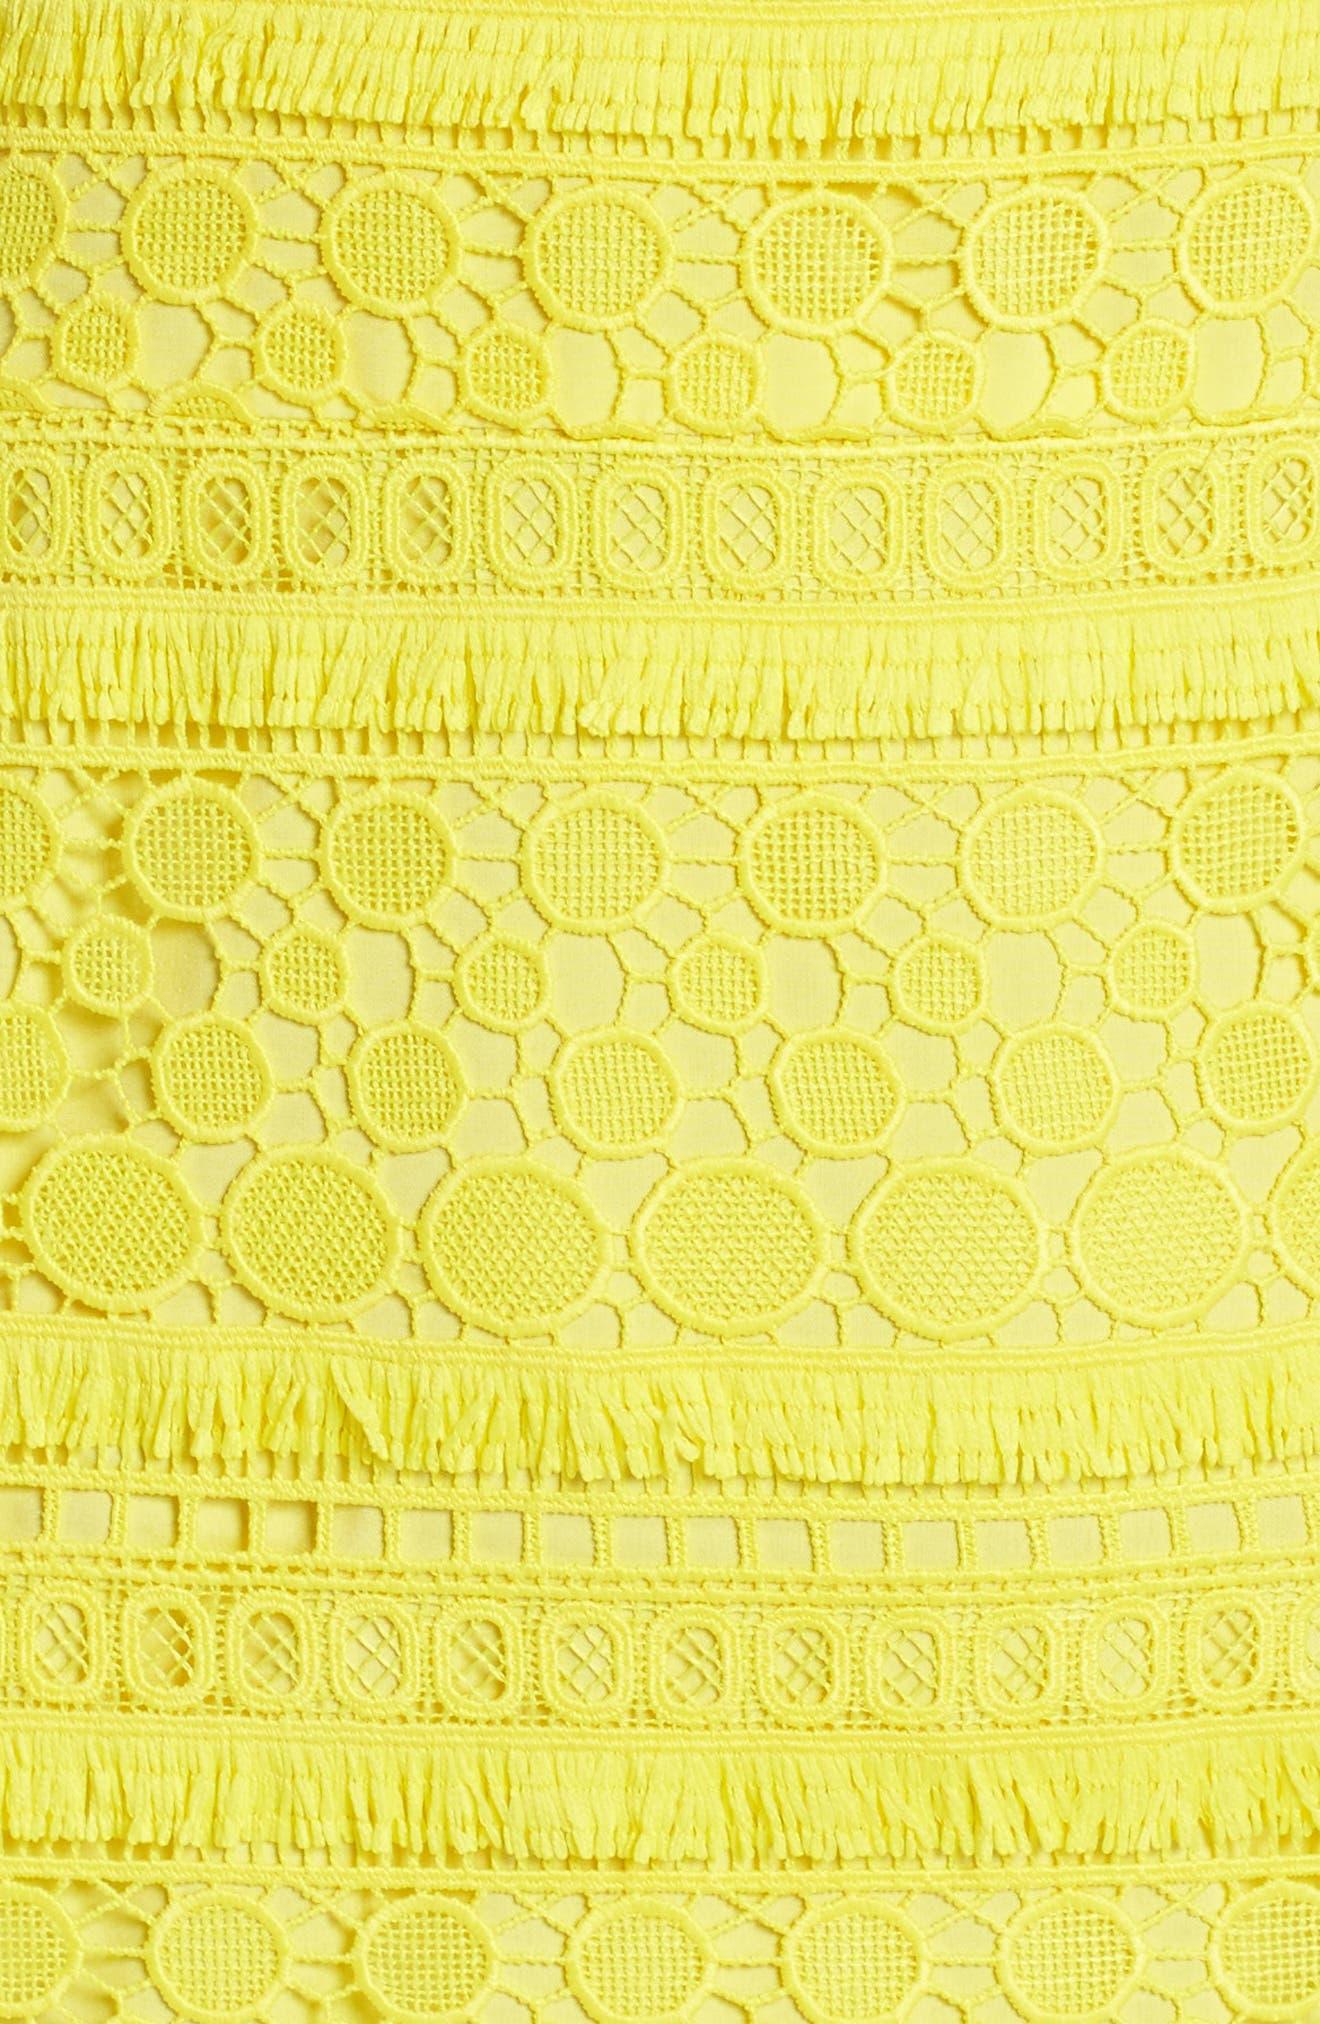 Lace Sheath Dress,                             Alternate thumbnail 5, color,                             737